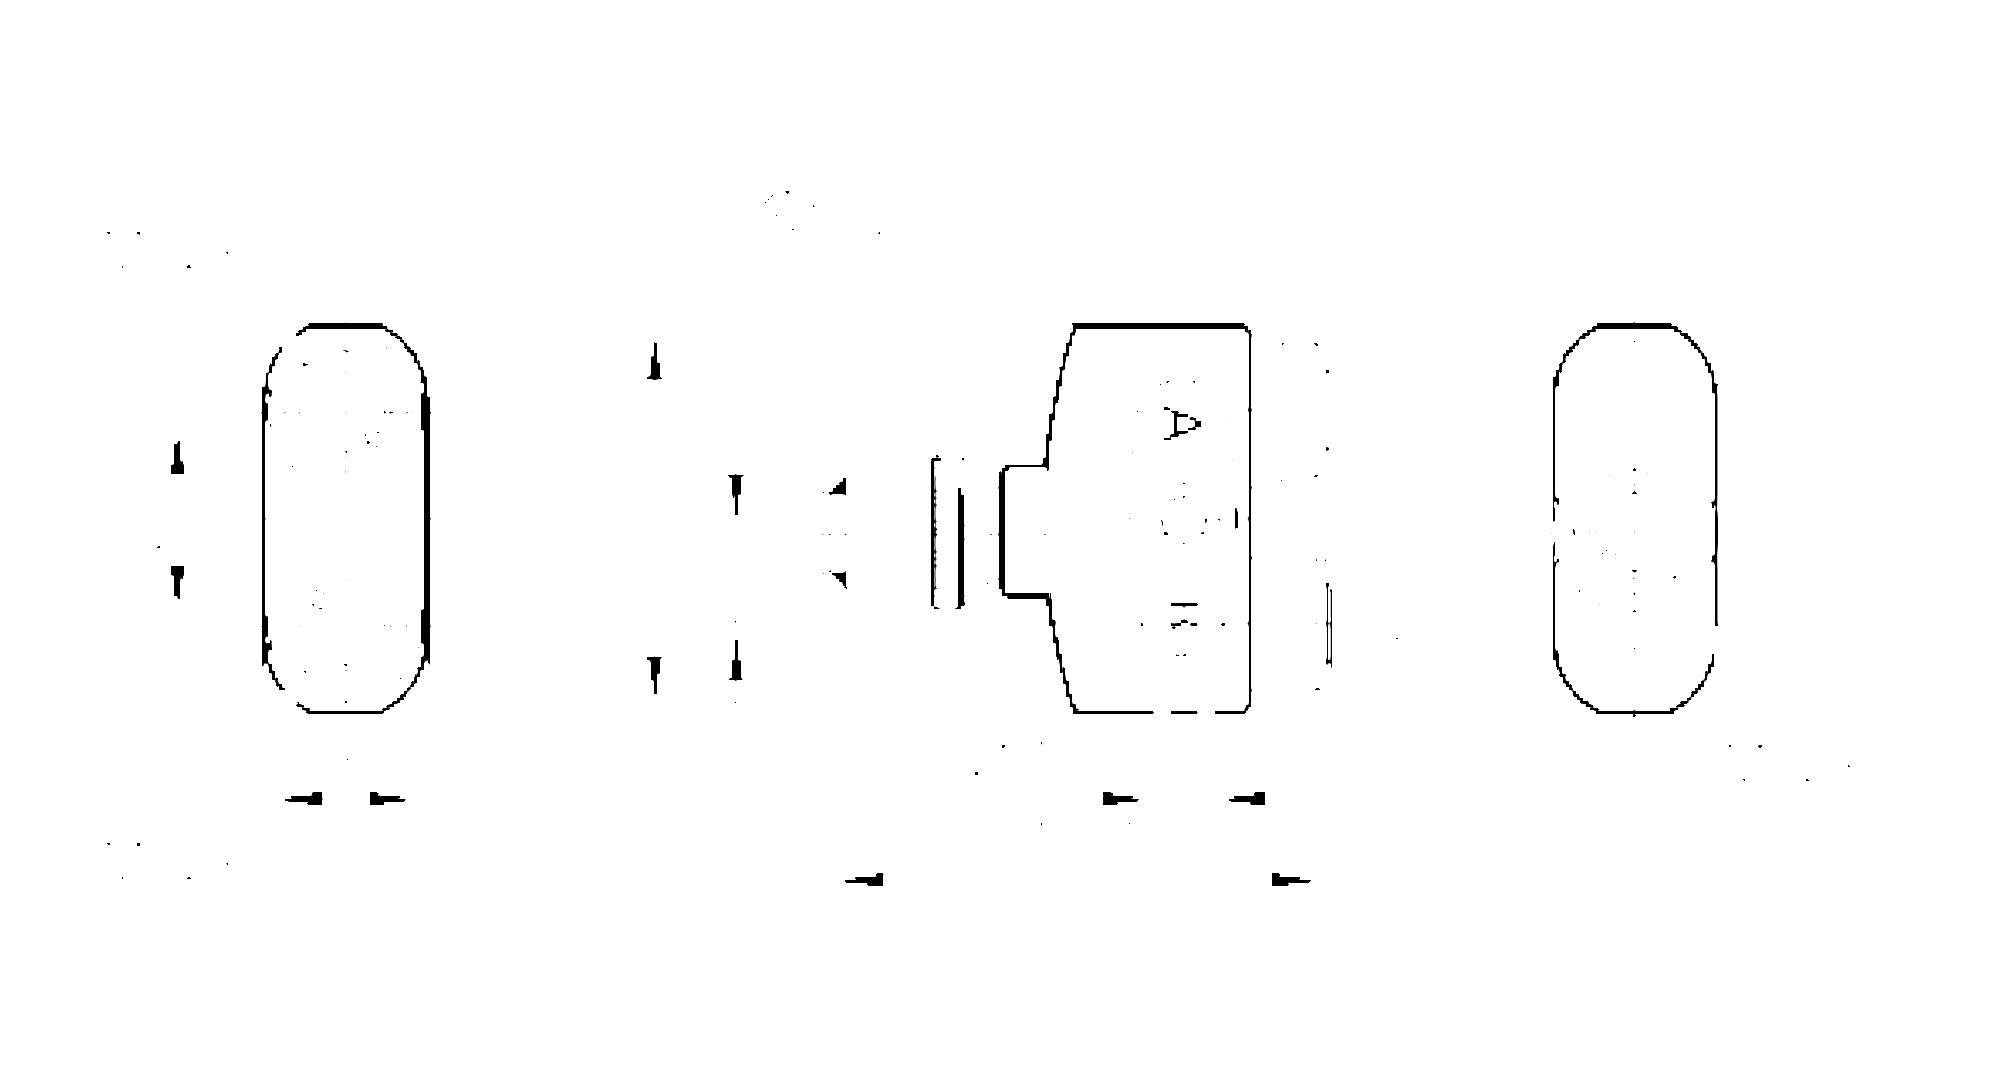 ebc115 - y-splitter